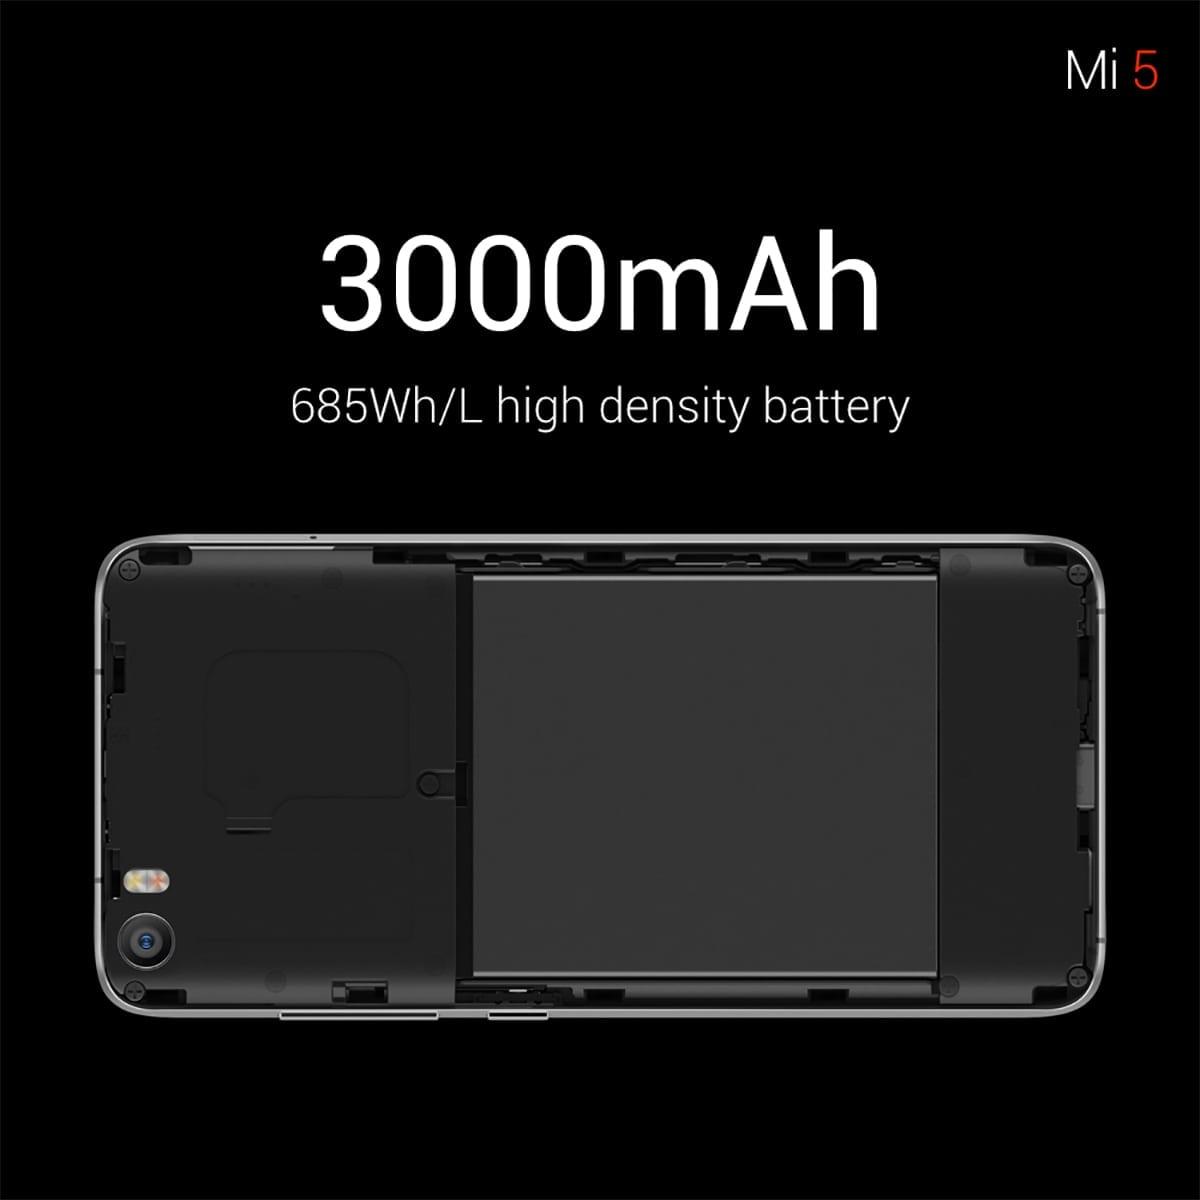 xiaomi mi5 battery